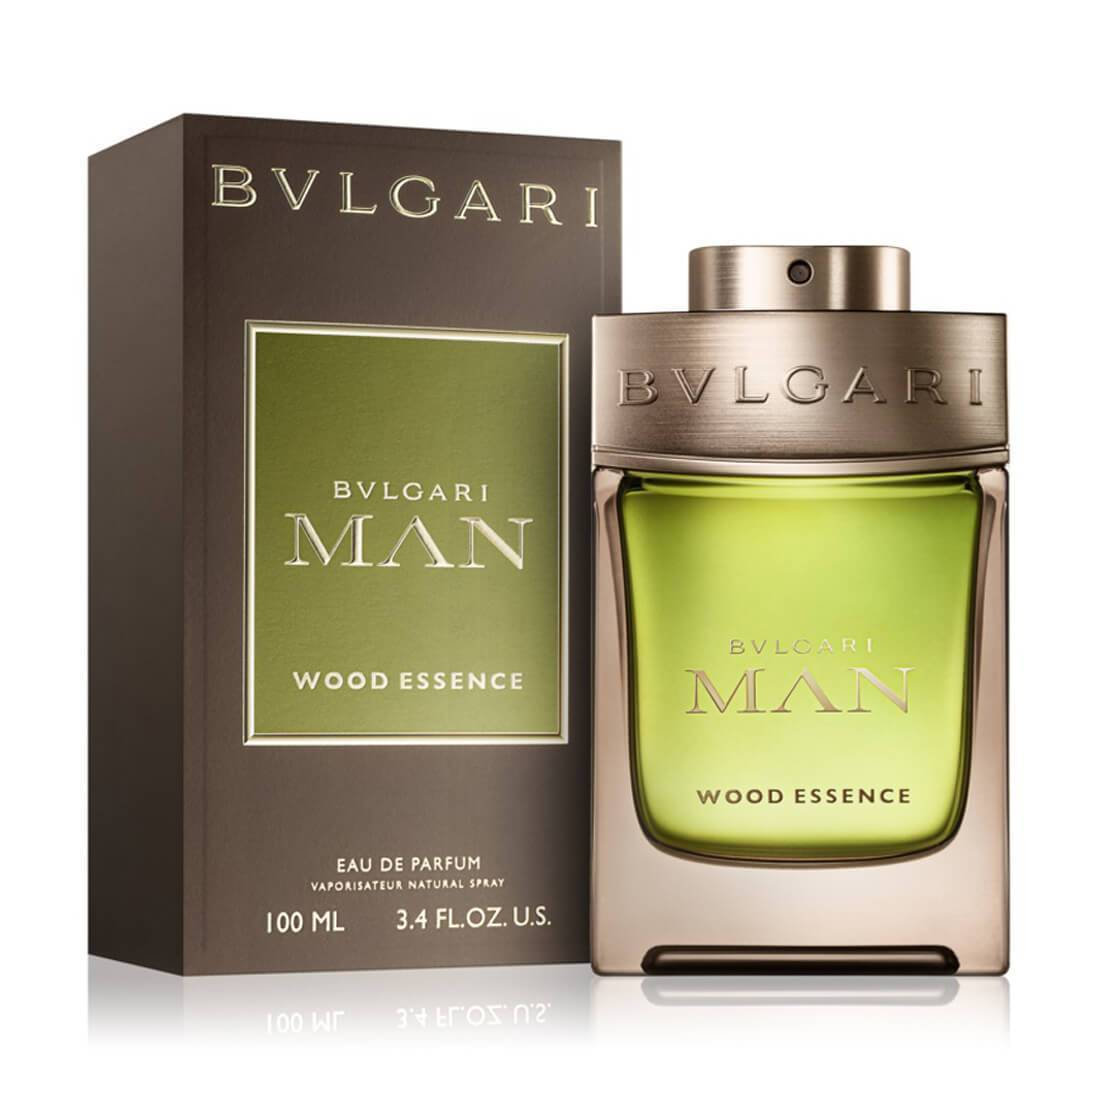 bvlargi wood essence mens fragrances